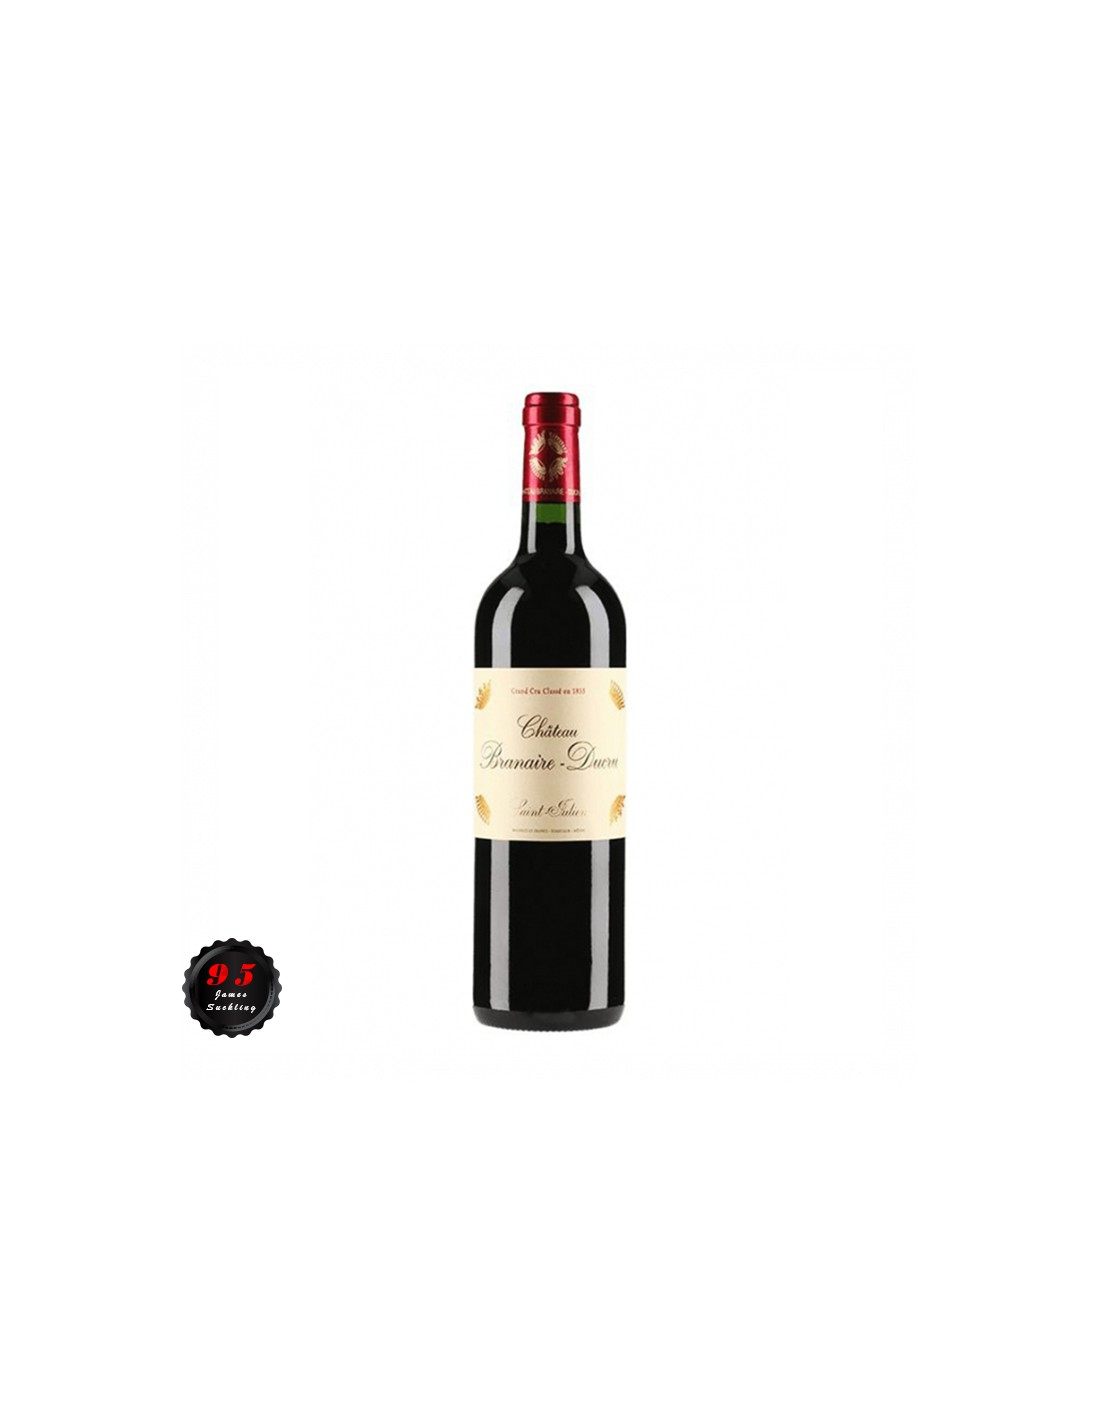 Vin rosu, Cupaj, Château Branaire-Ducru Saint-Julien, 0.75L, 12.8% alc., Franta